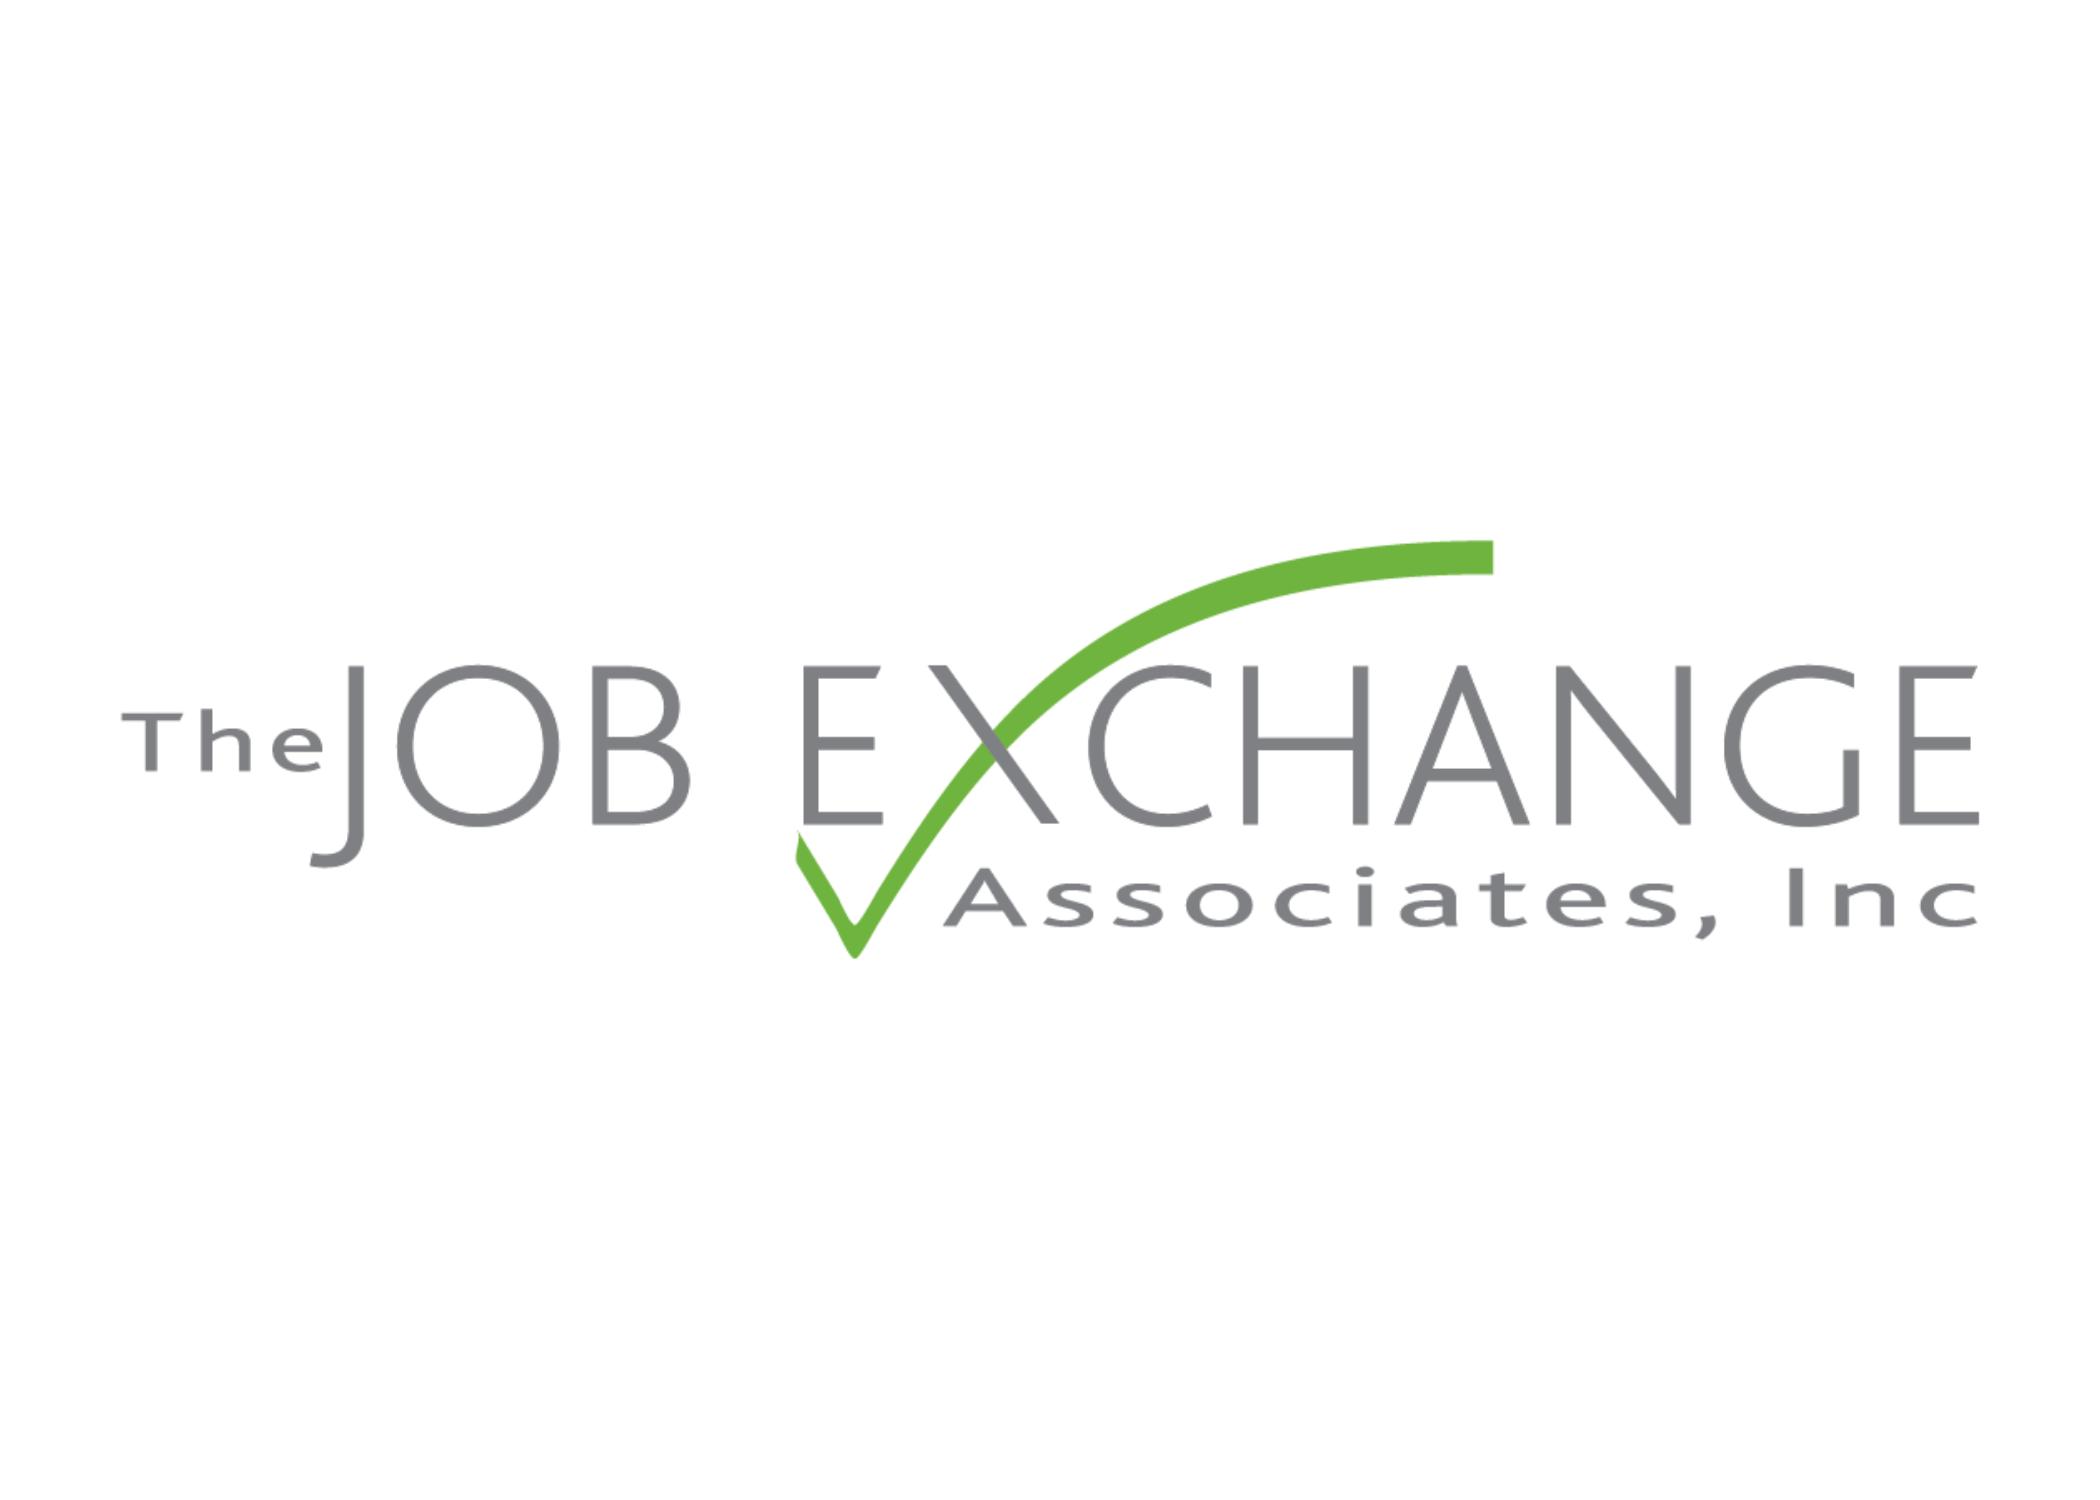 The Job Exchange